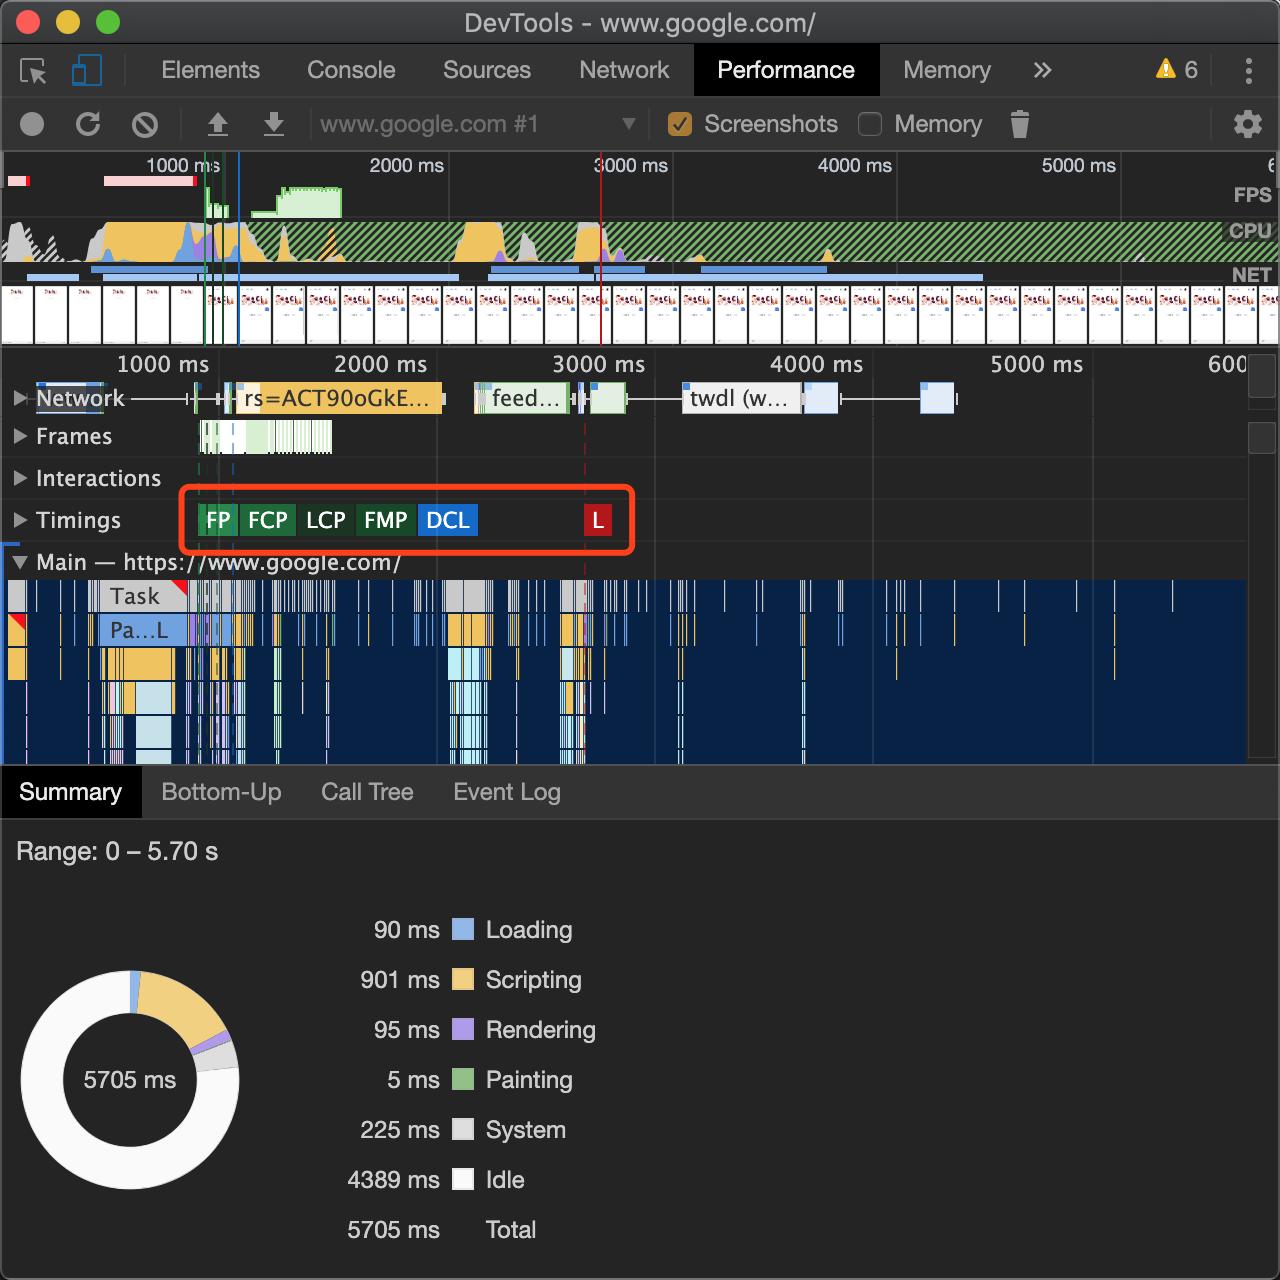 图2 - Chrome DevTools 报告